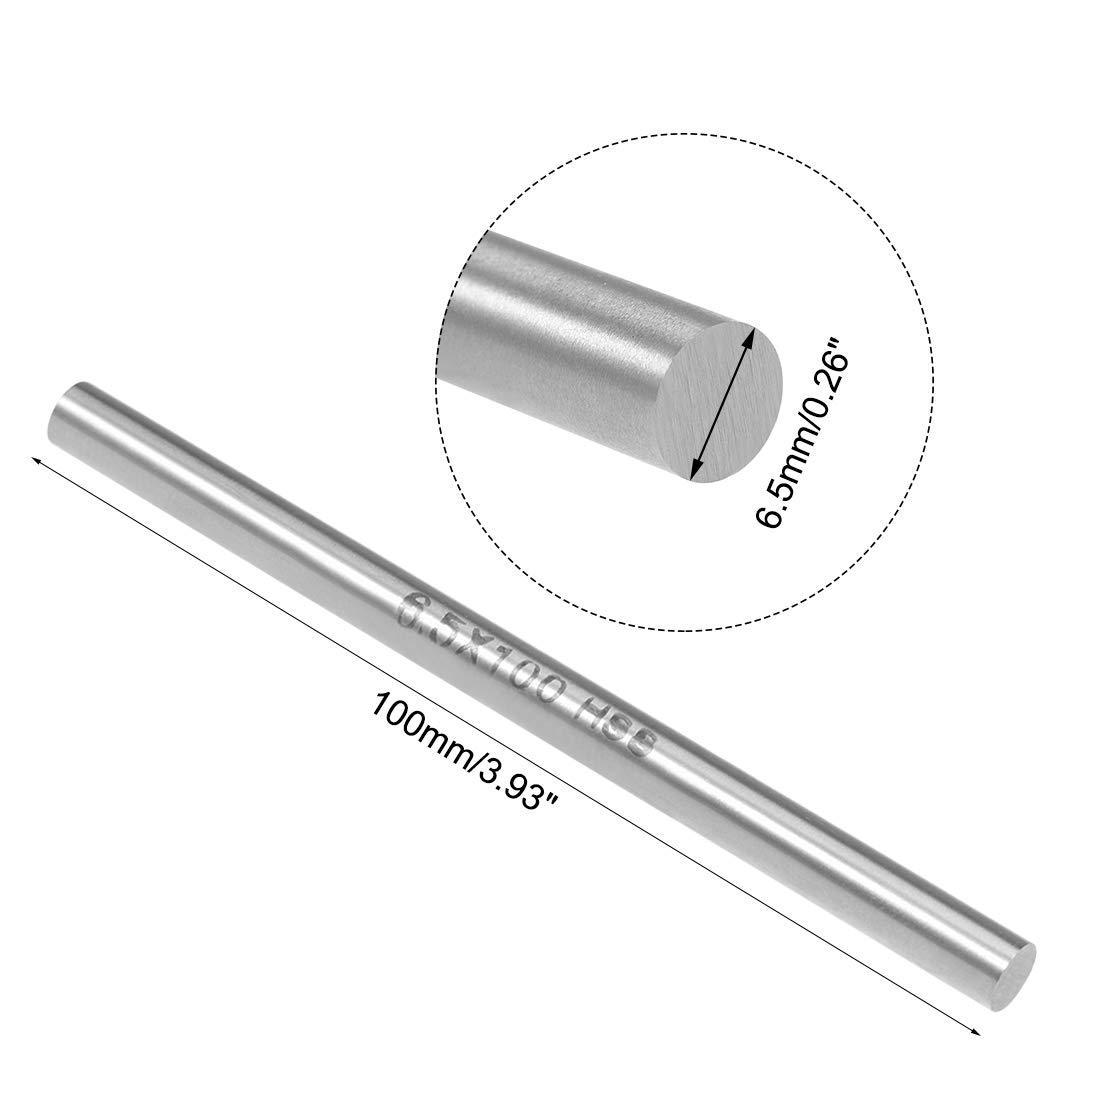 uxcell HSS Lathe Round Rod Solid Shaft Bar 9mm Dia 100mm Length 5Pcs